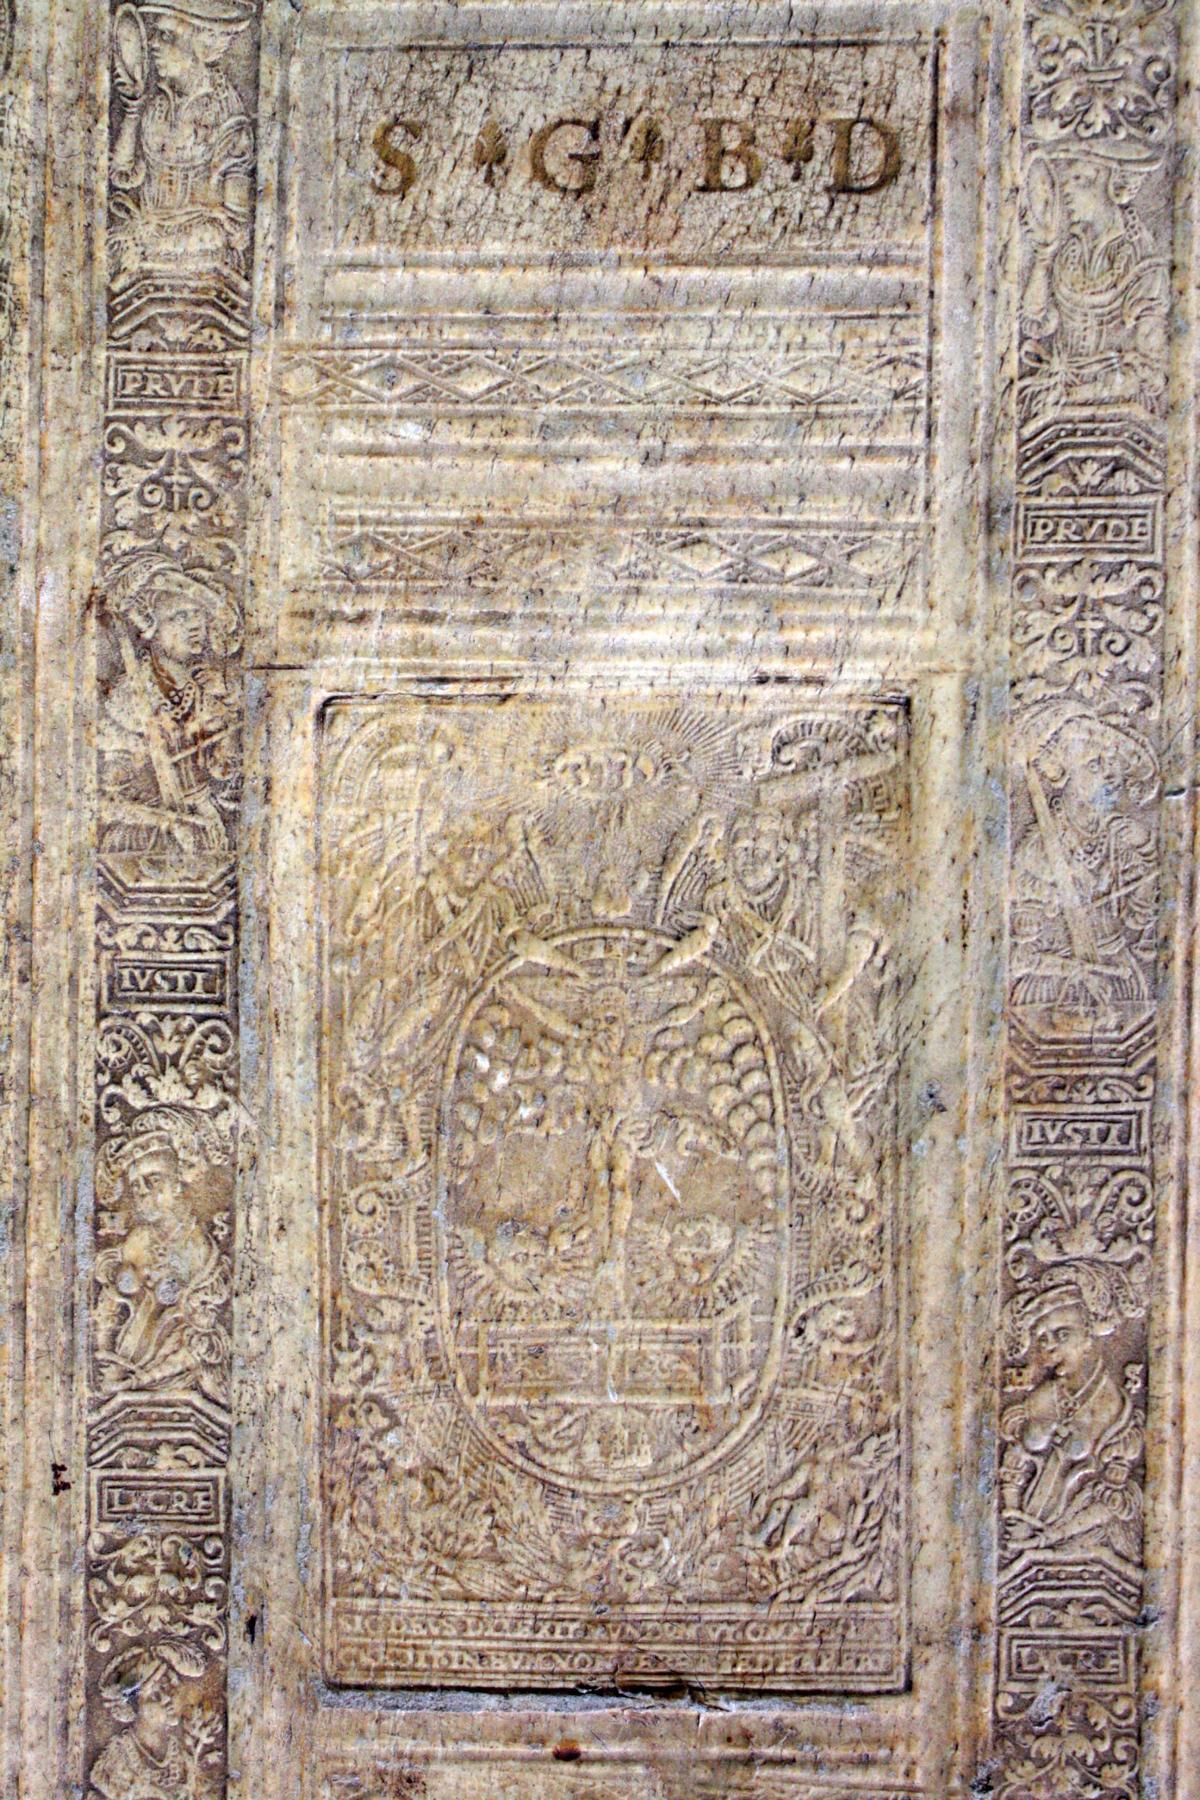 Griechische-Lateinische Bibel, Novum Testamentum 1582-4